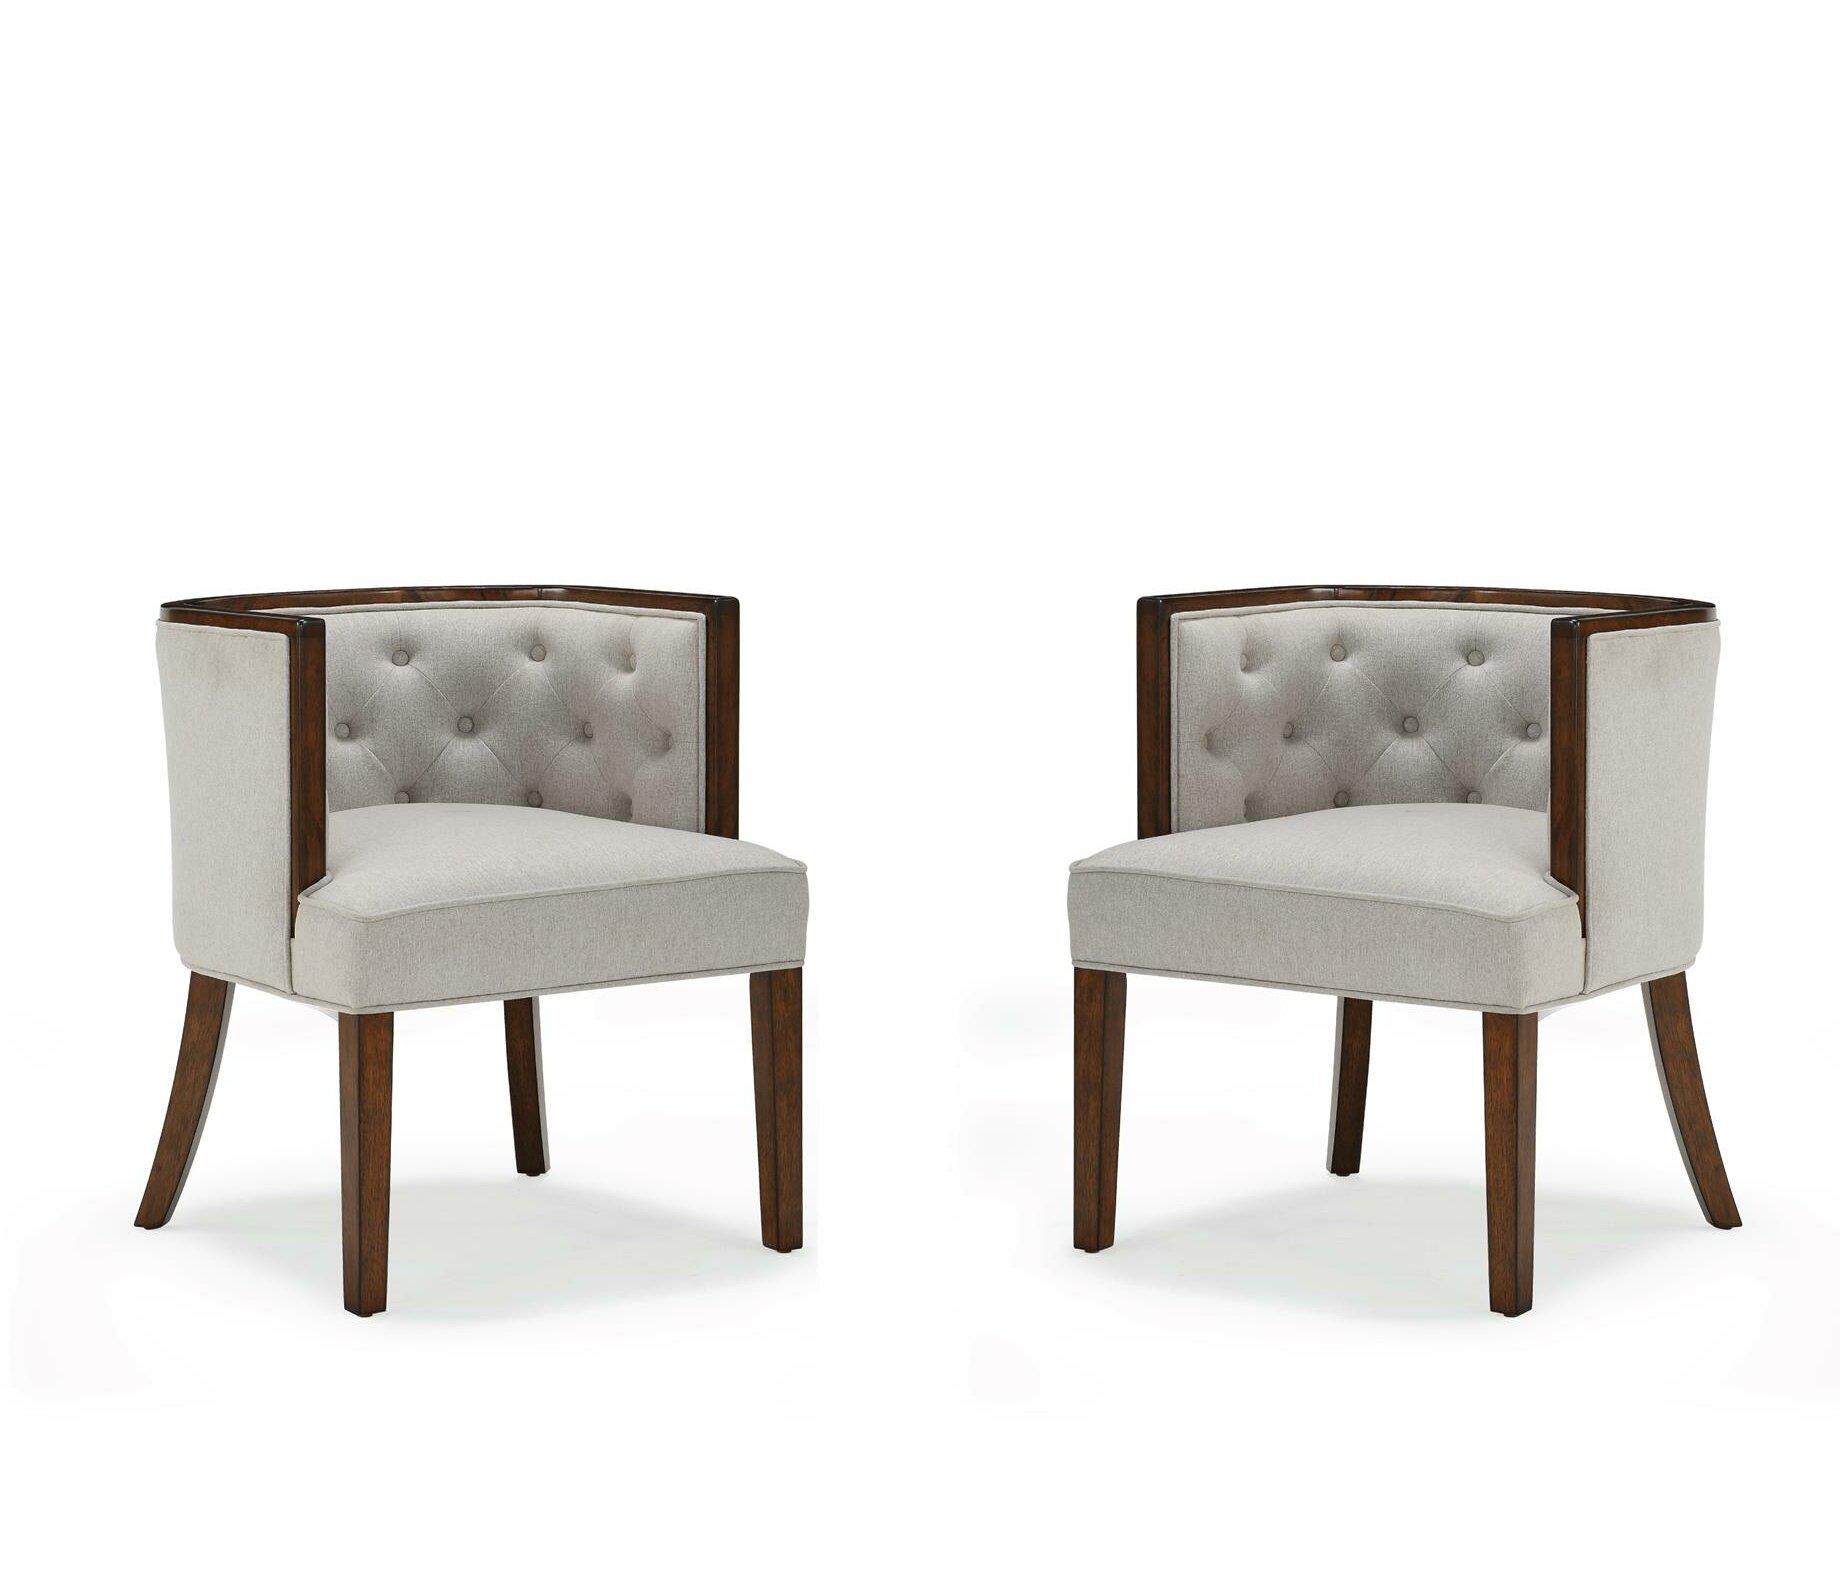 "Danny 20"" Barrel Chair (Set Of 2) Regarding Danny Barrel Chairs (Set Of 2) (View 3 of 15)"